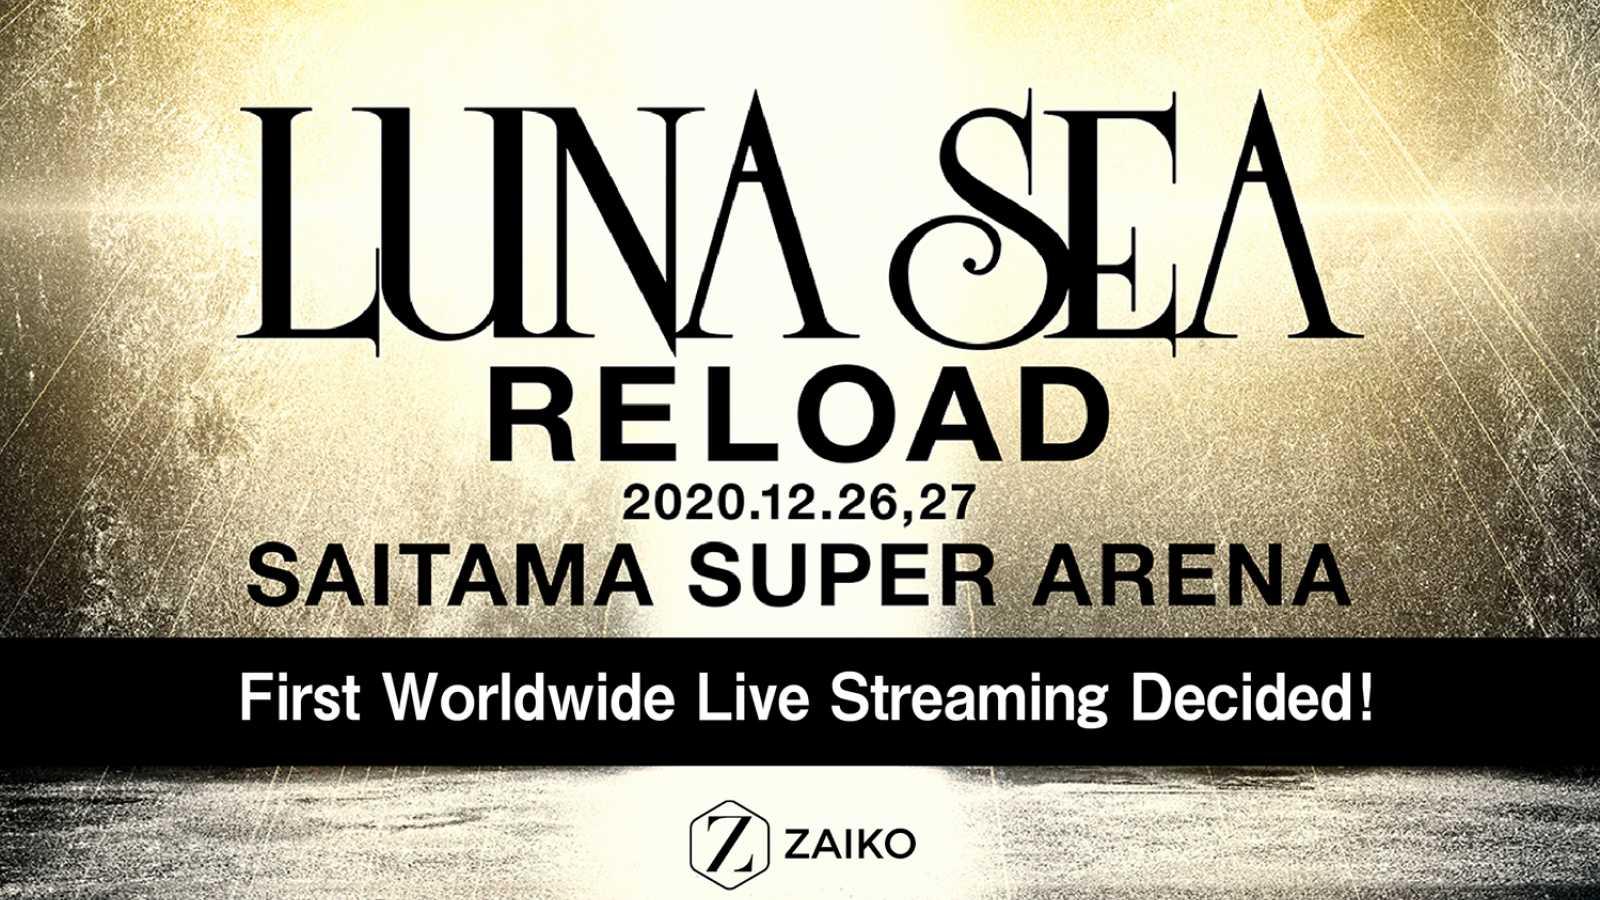 LUNA SEA to Live Stream Saitama Super Arena Shows Worldwide © LUNA SEA. All rights reserved.